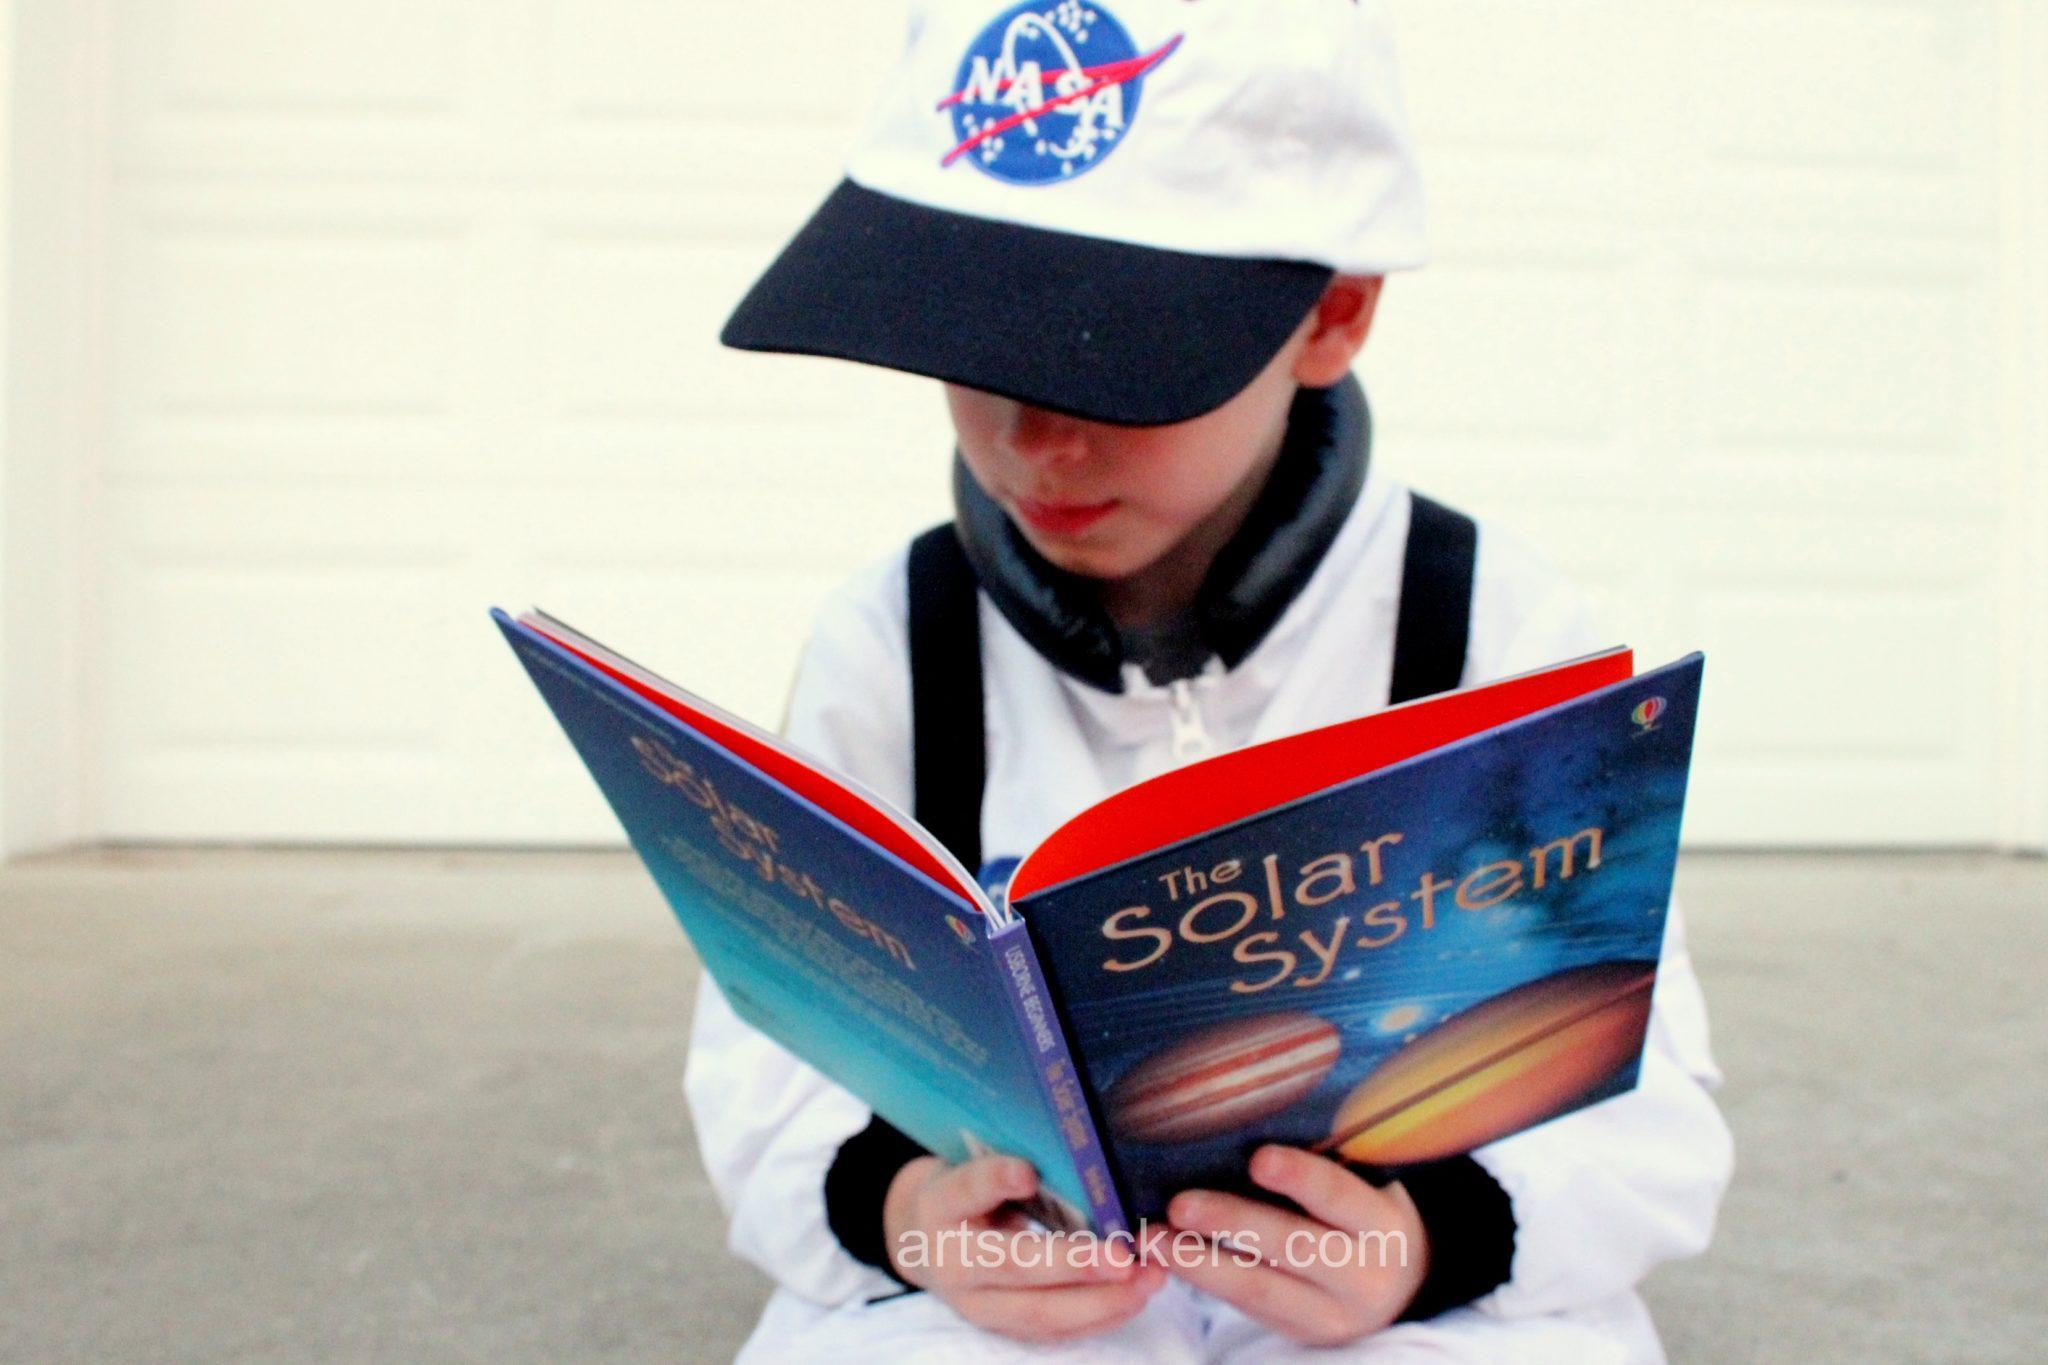 astronaut reading book - photo #26